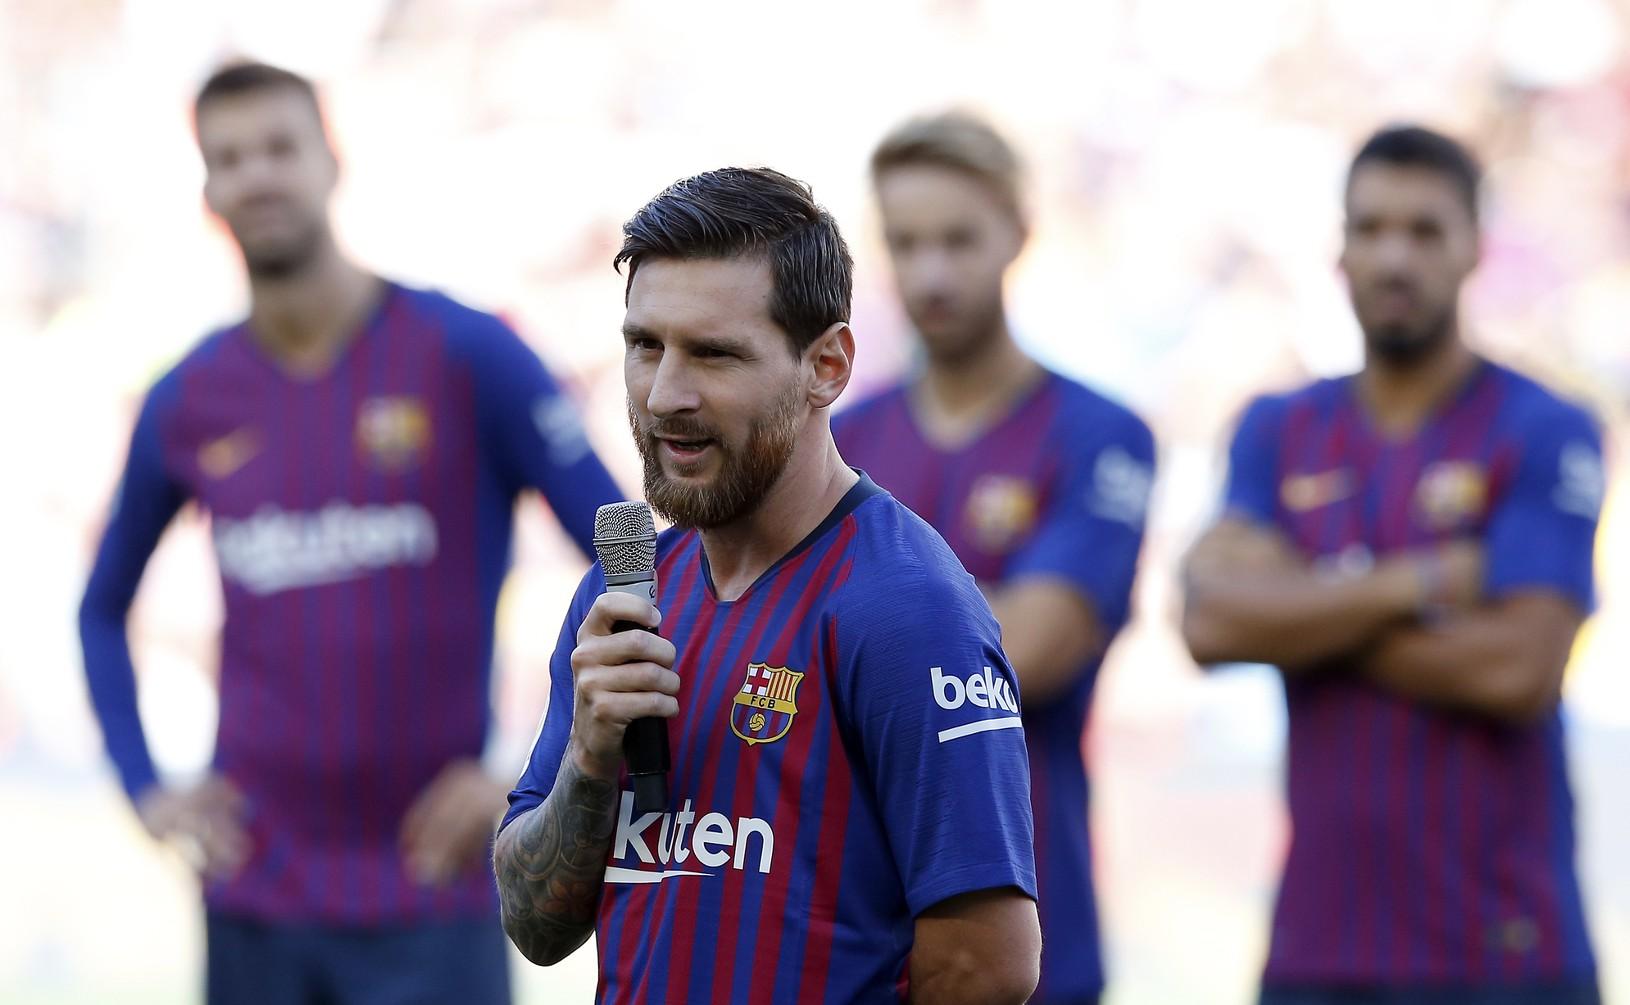 Lionel Messi v predzápasovom